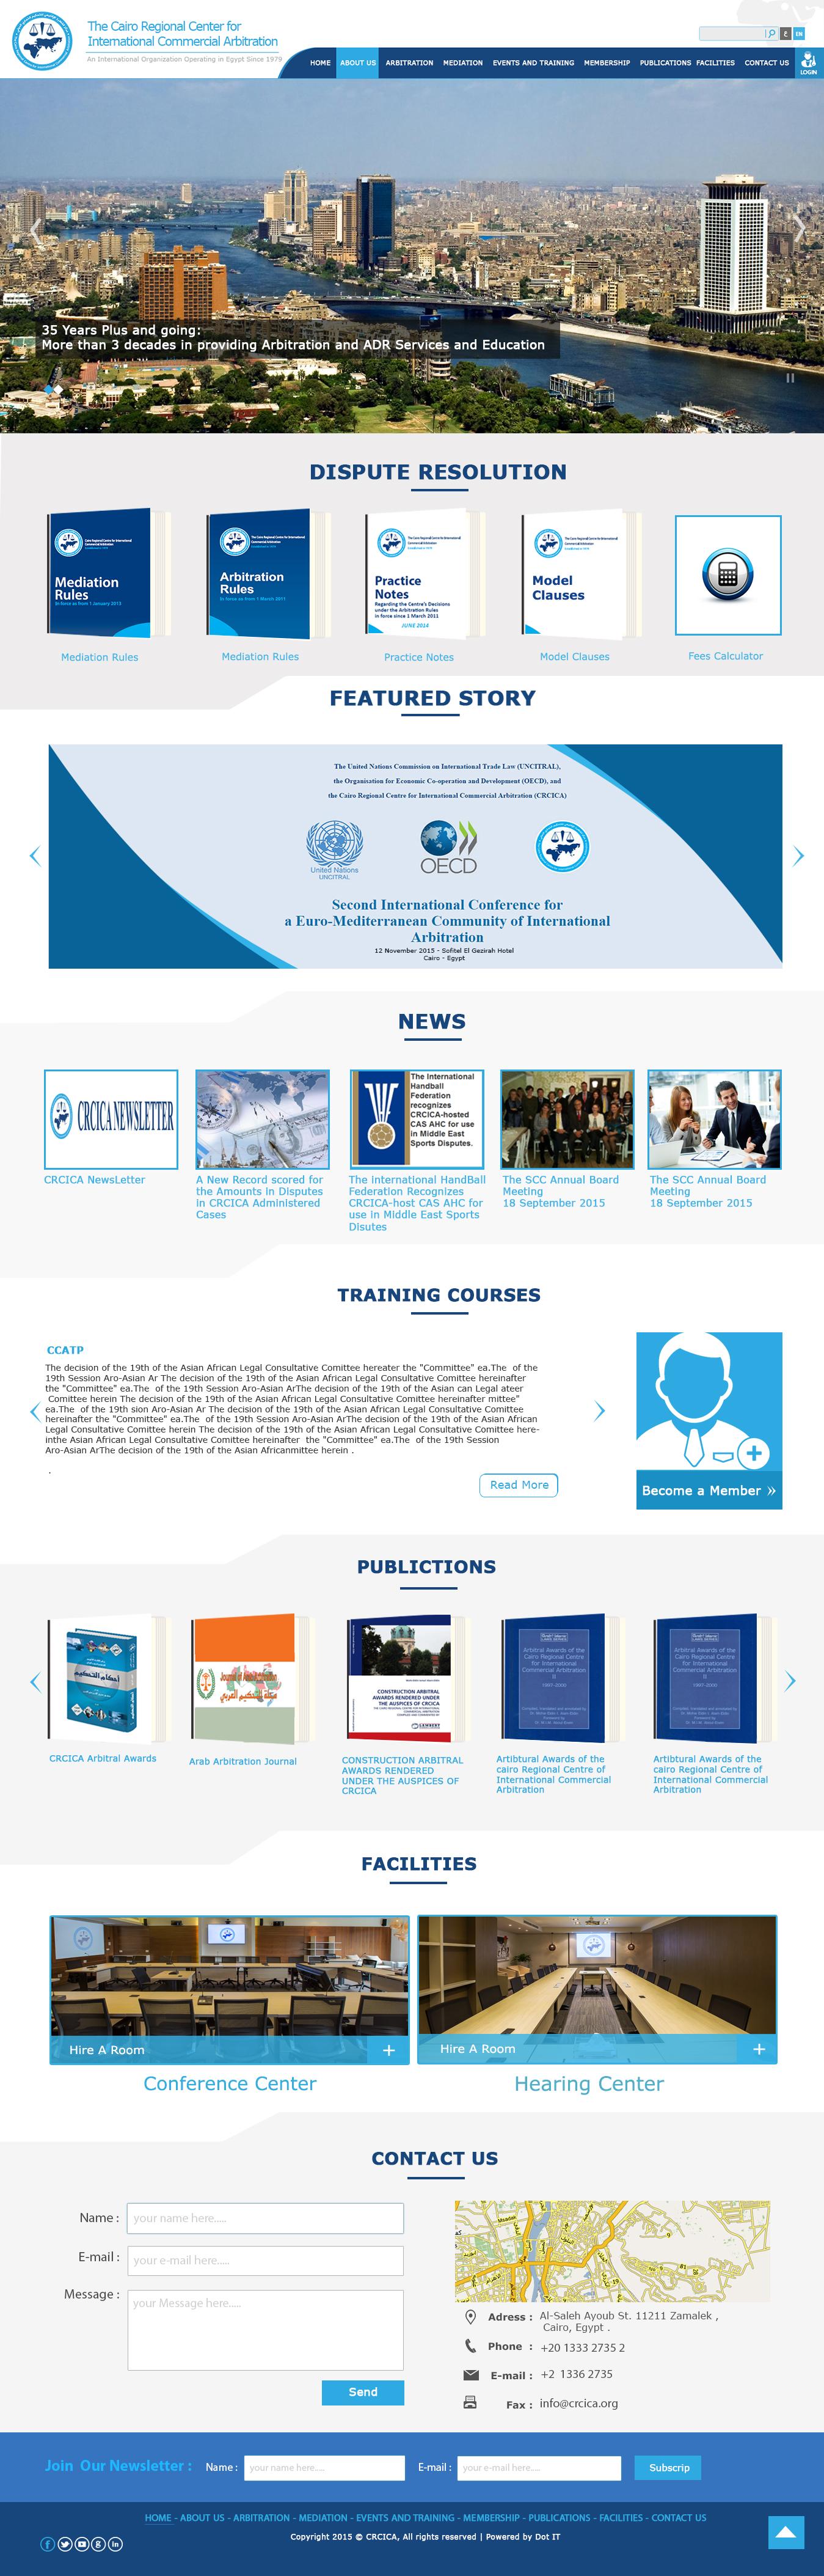 The Cairo Regional Centre For International Commercial Arbitration Crcica Is An Independent Non Portfolio Website Design Quality Web Design Portfolio Design